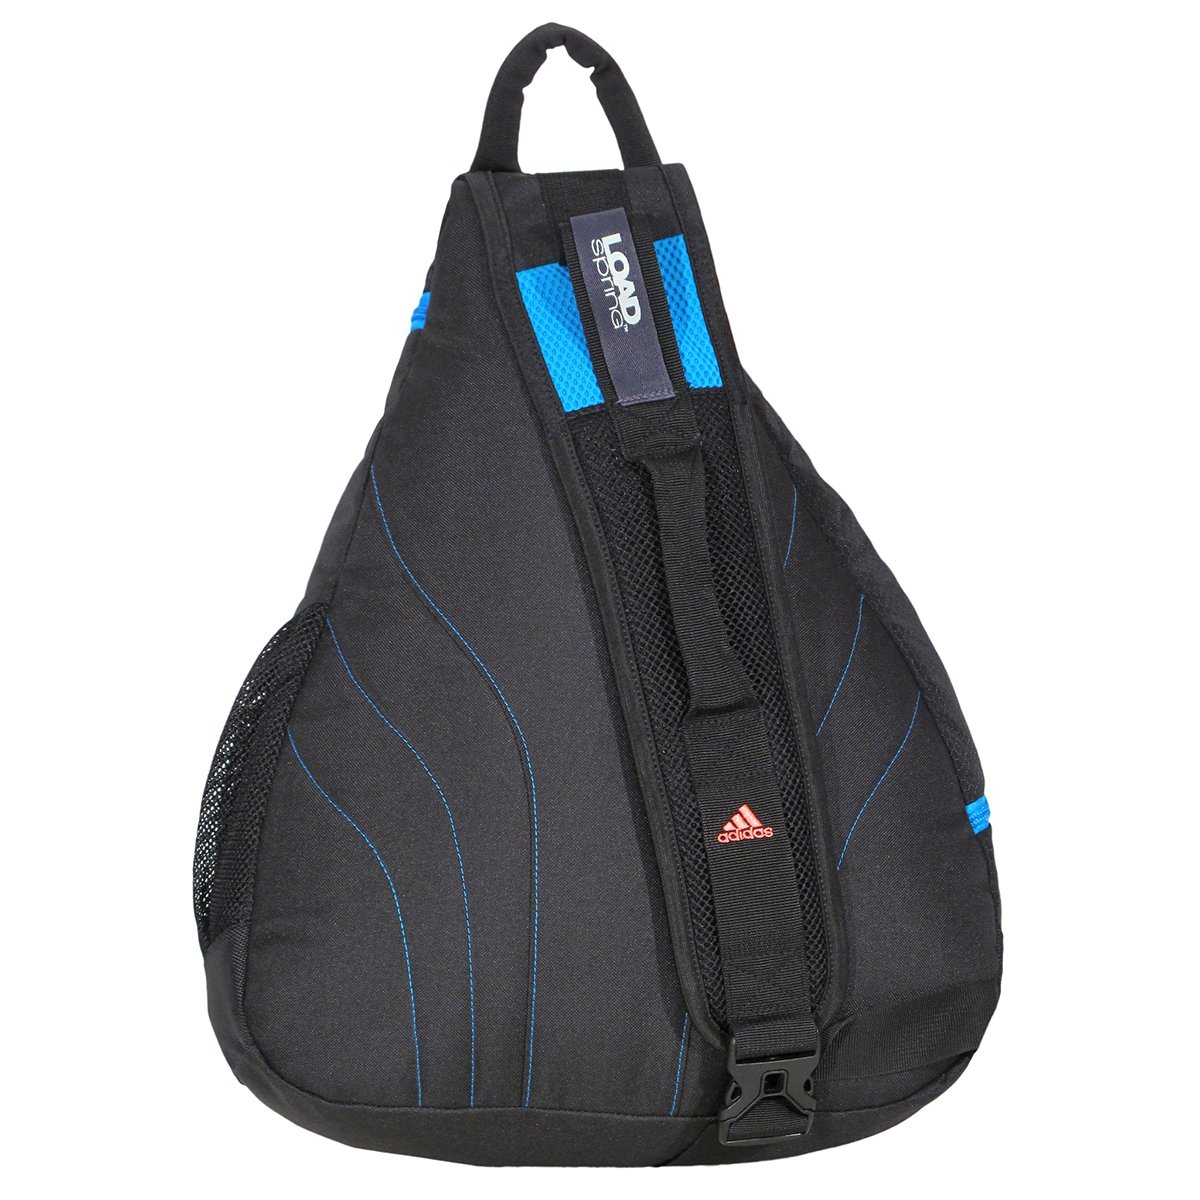 Adidas Capital Ii Sling Backpack- Fenix Toulouse Handball 673f84ddb0743